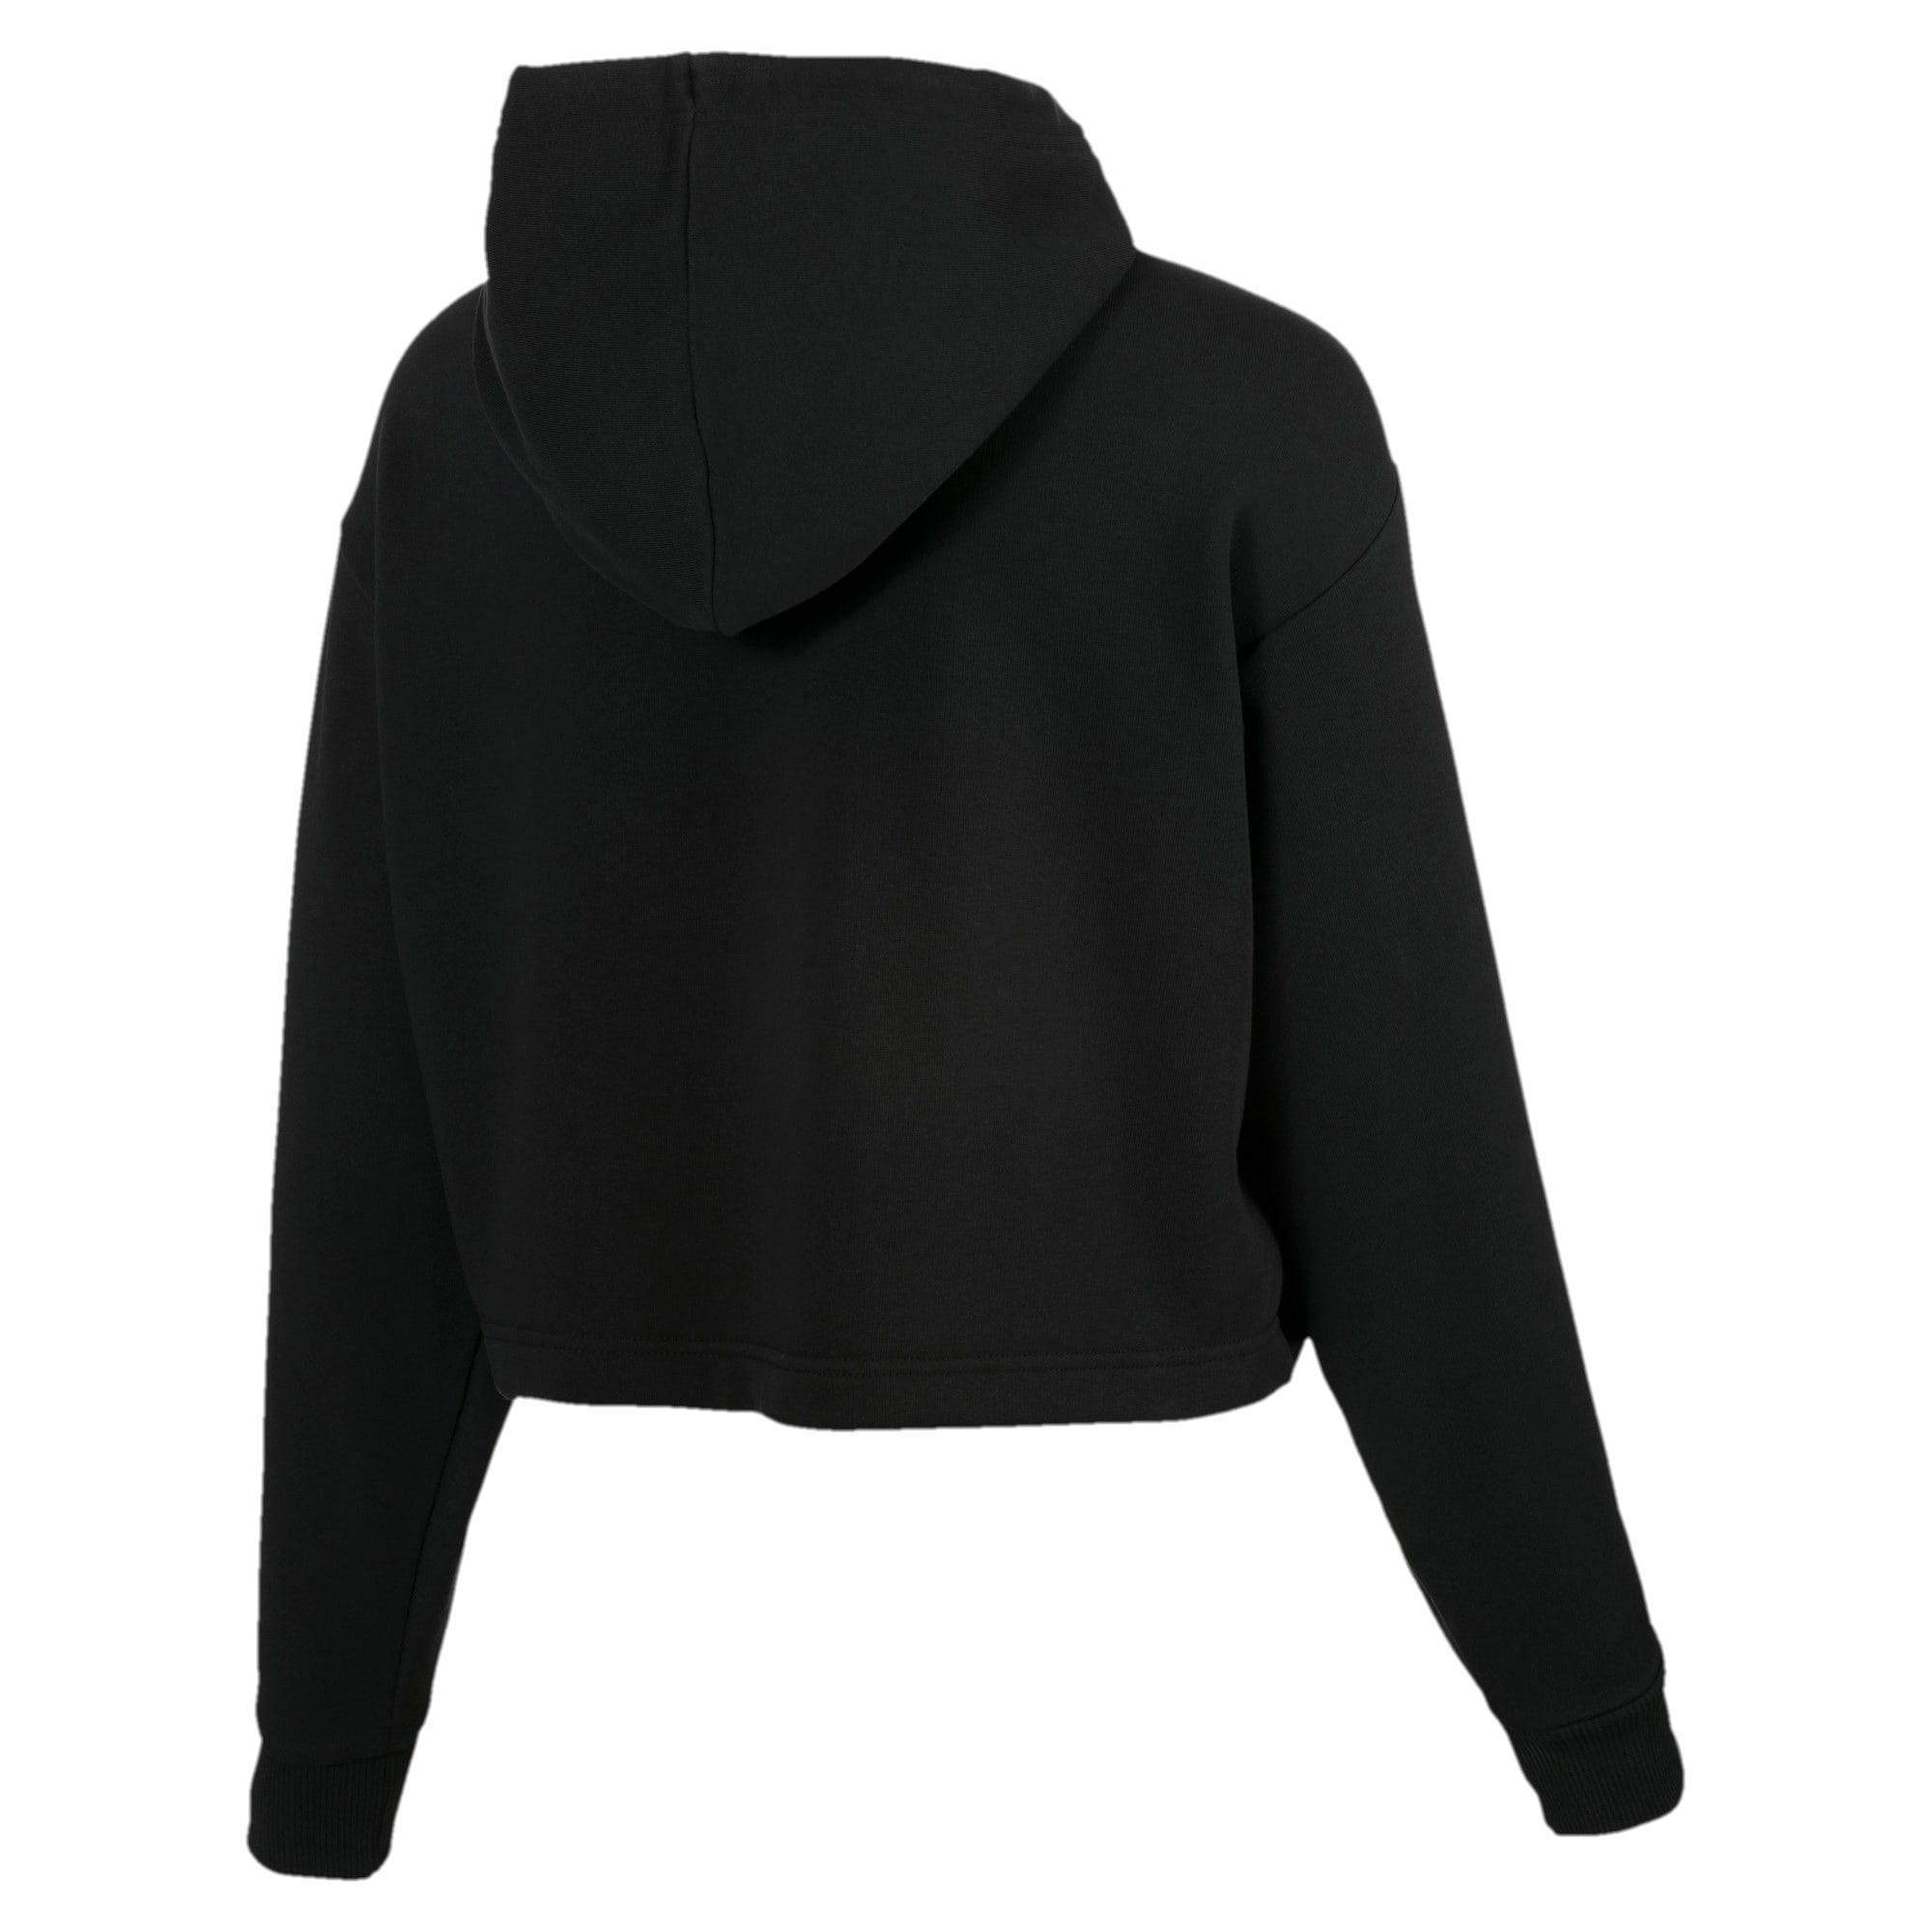 Thumbnail 5 of Trailblazer Women's Hoodie, Cotton Black, medium